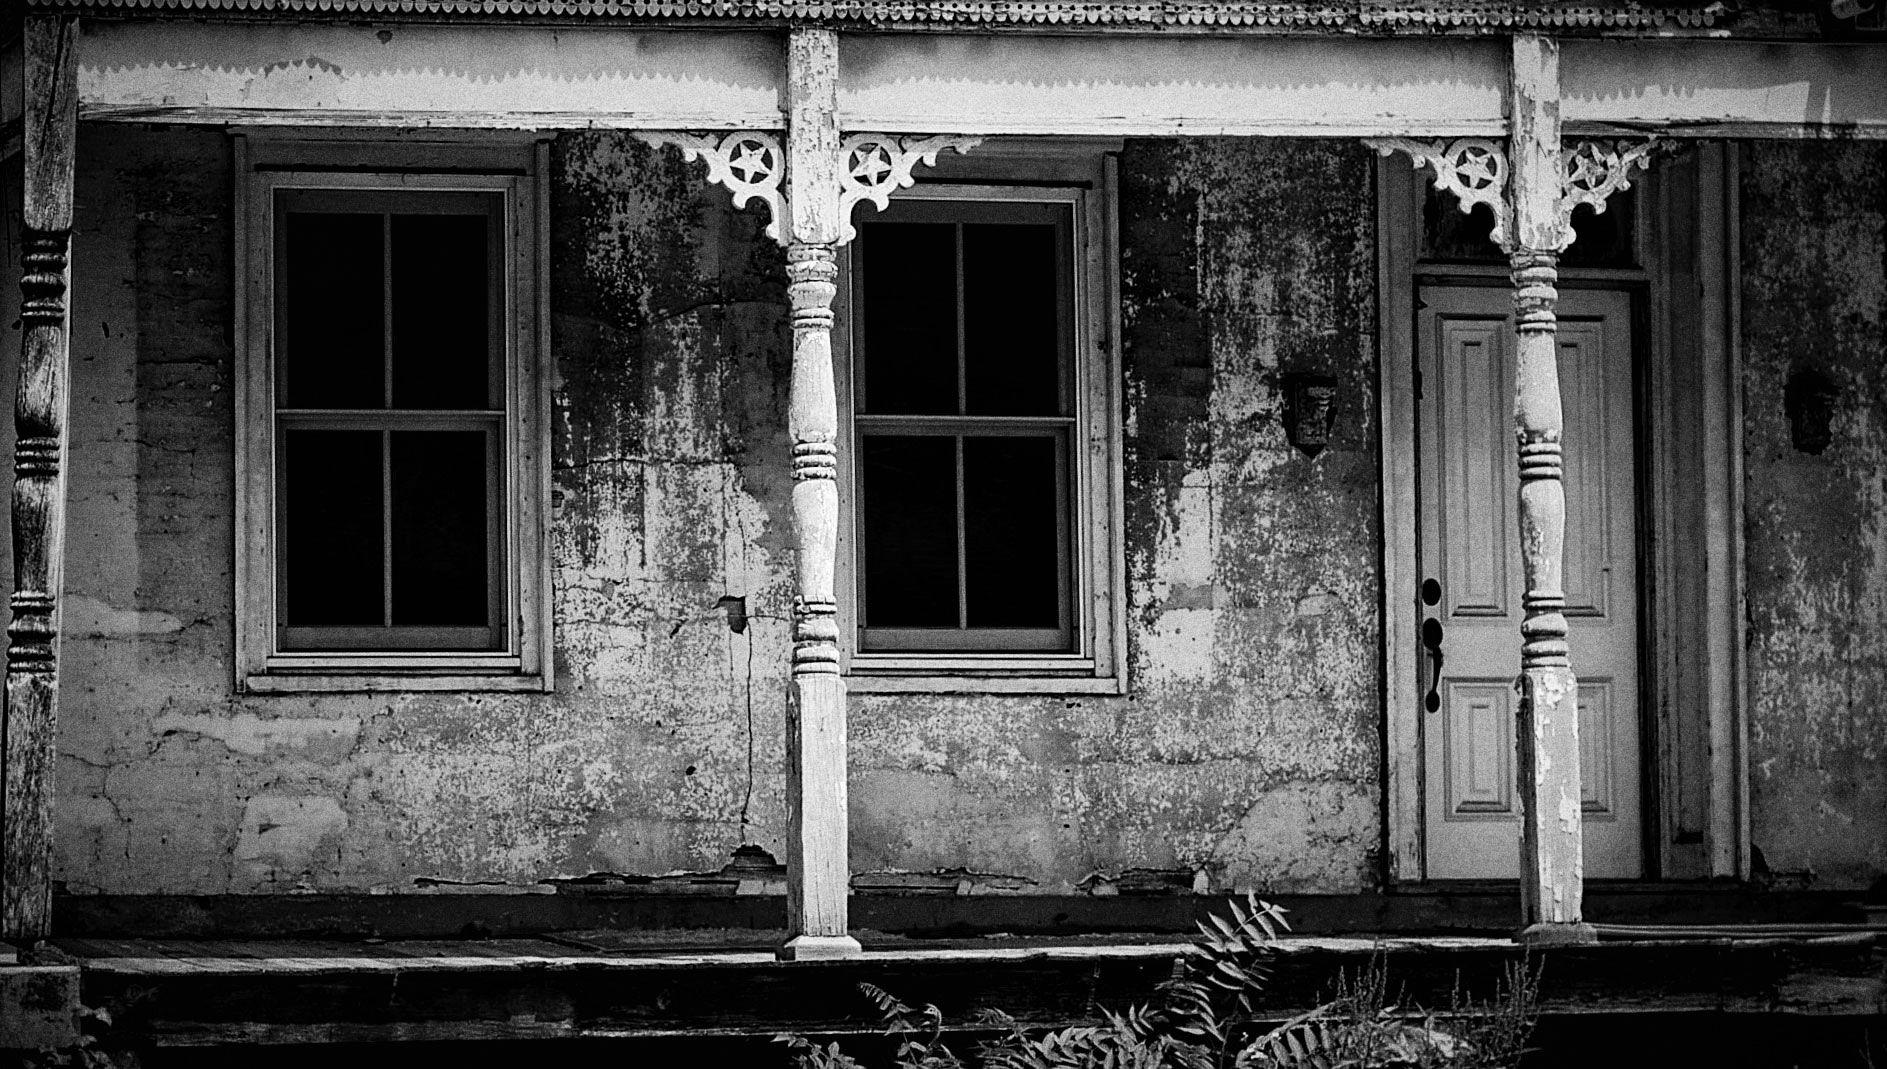 © Robin Rufe 2016 Porch, Kunkletown